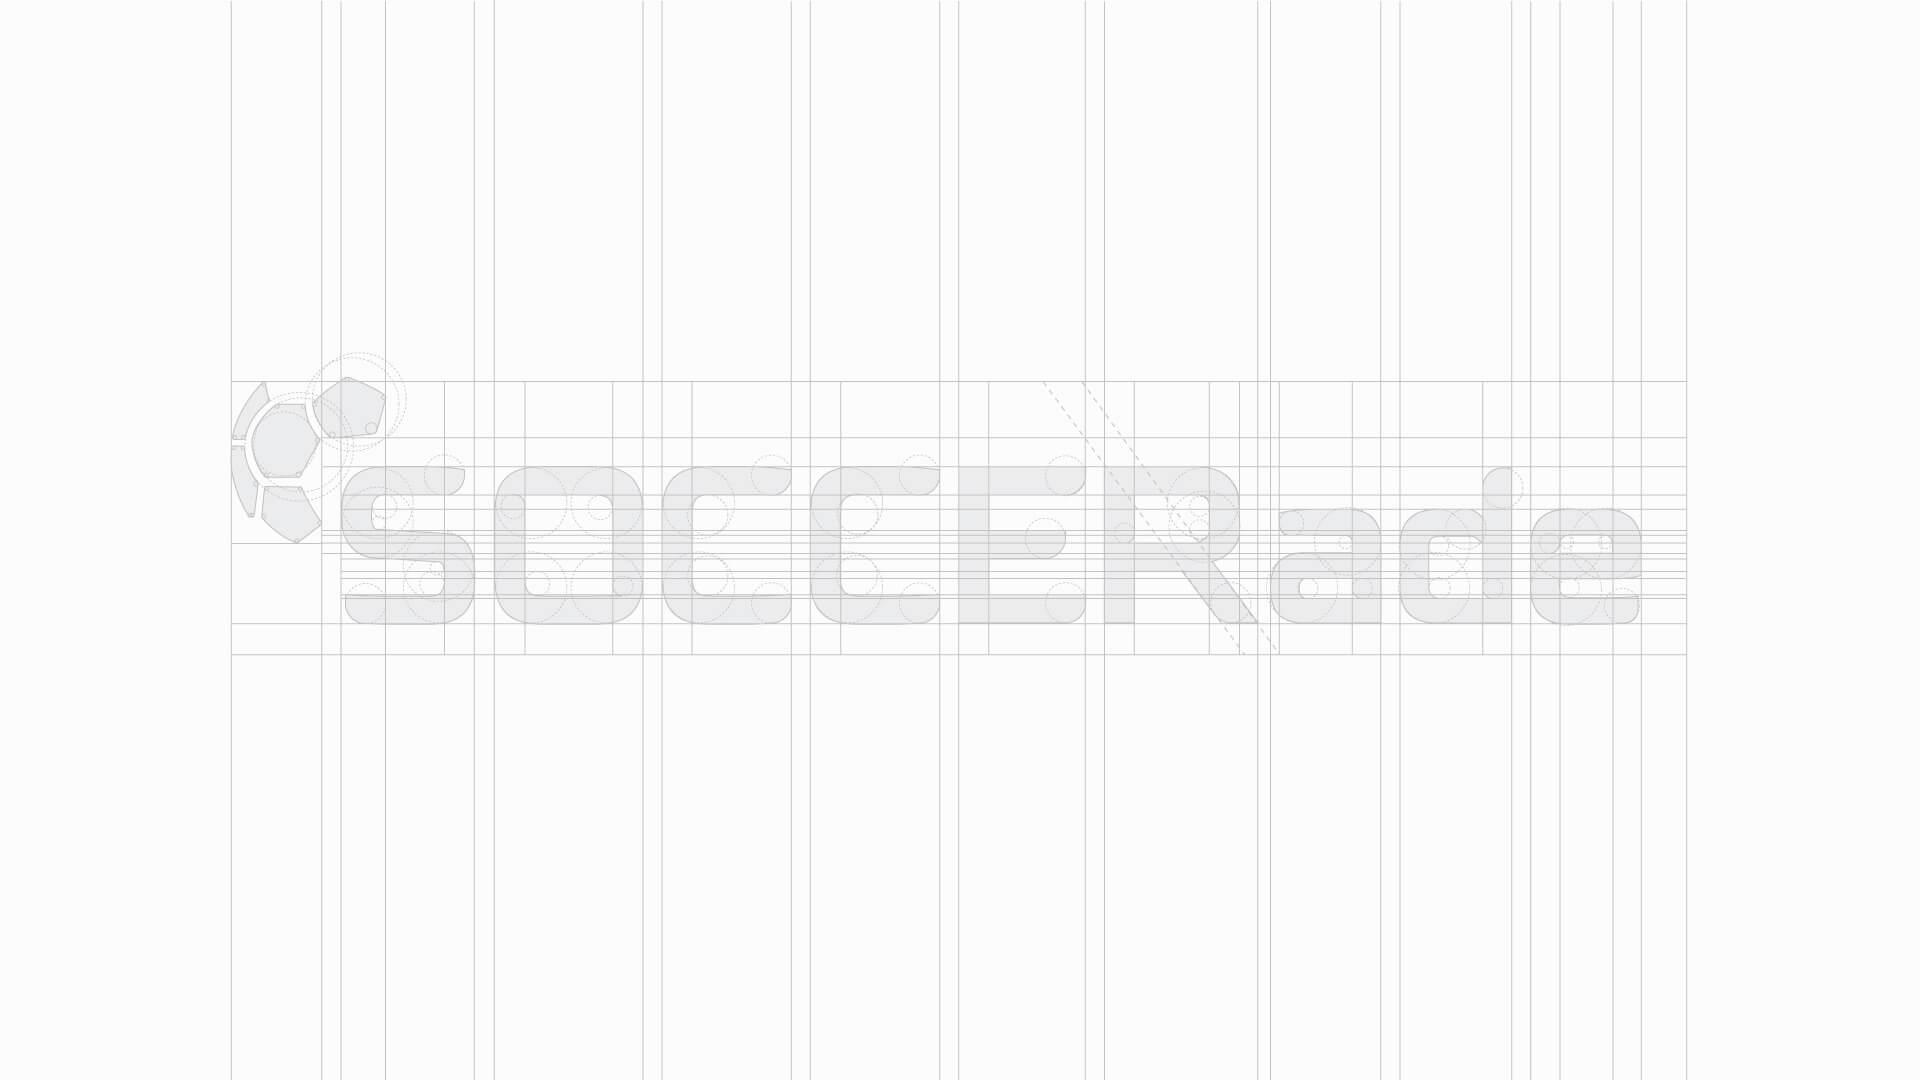 soccerade_logo_guidelines5